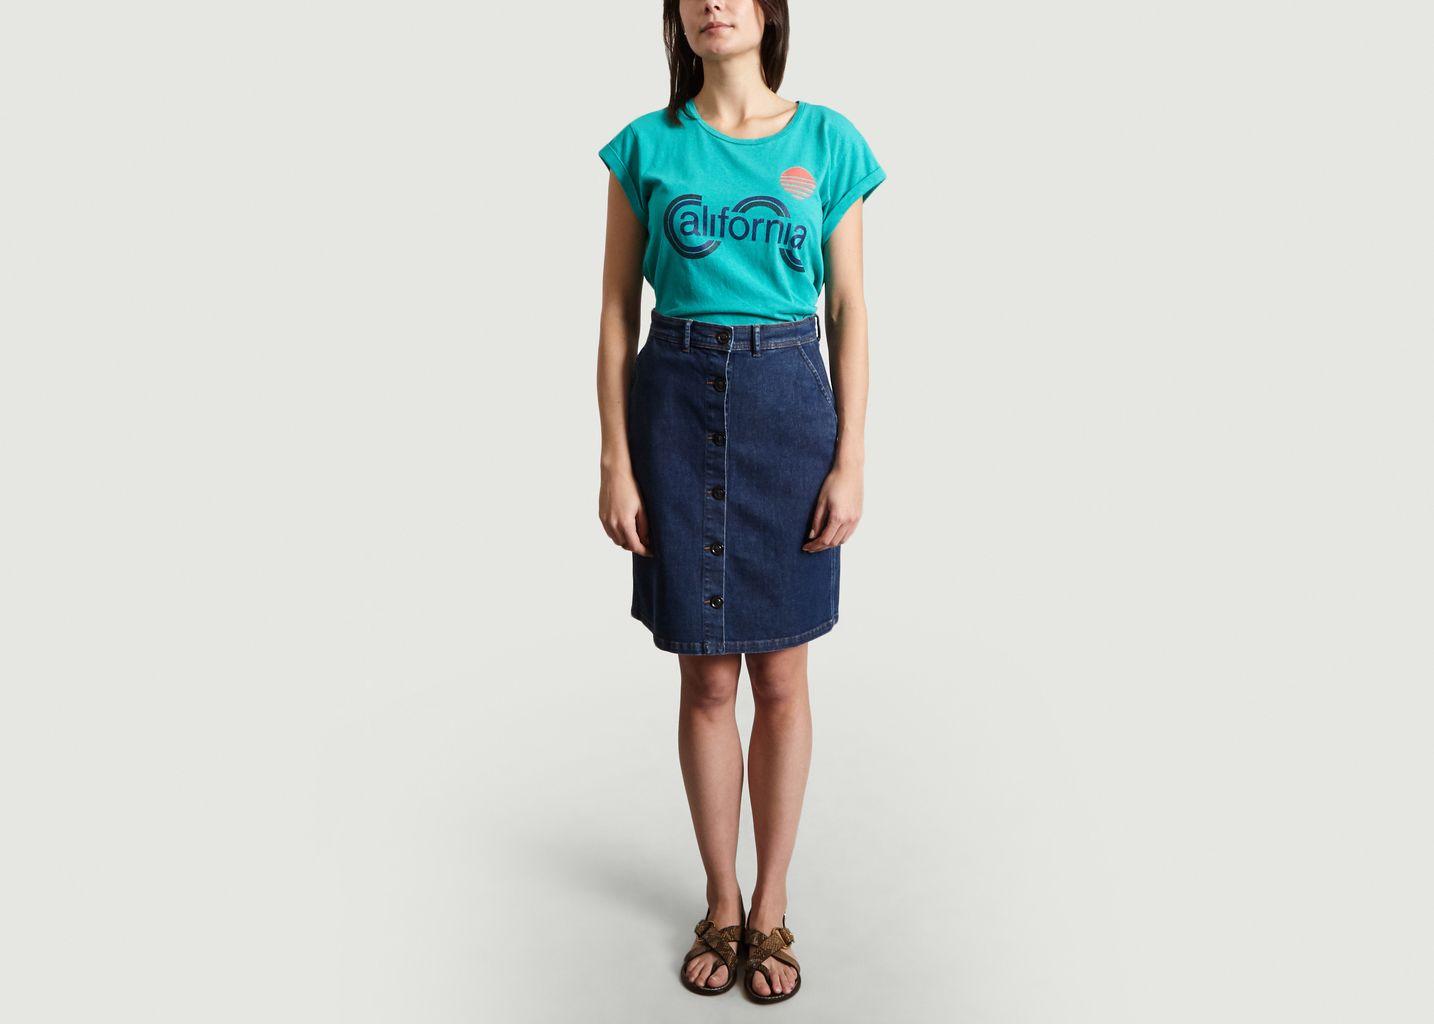 T-Shirt En Coton Et Lin Print California Valentin - Soeur